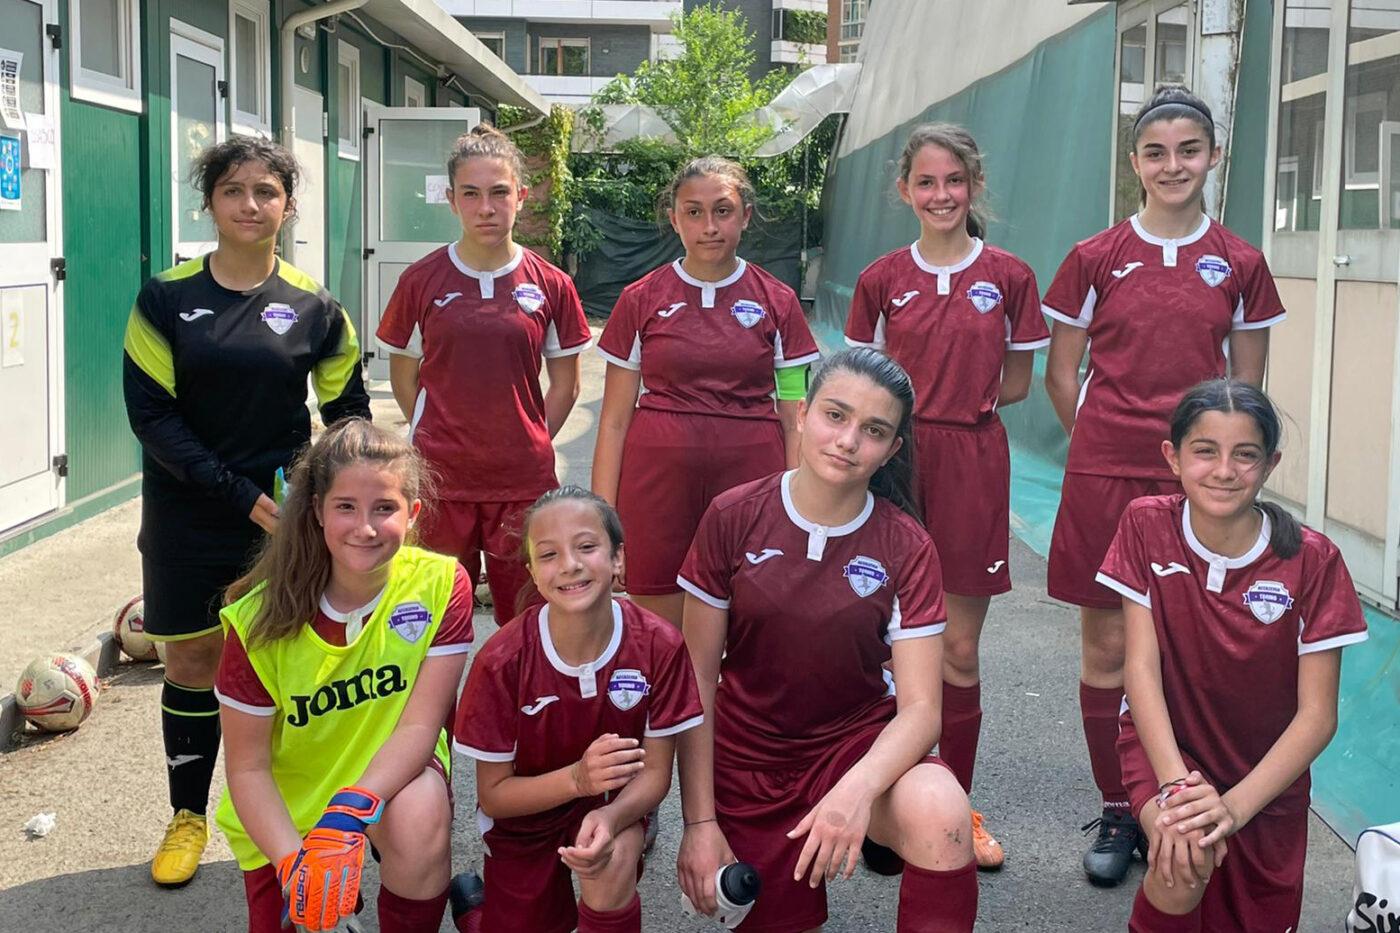 Accademia Torino Under 12